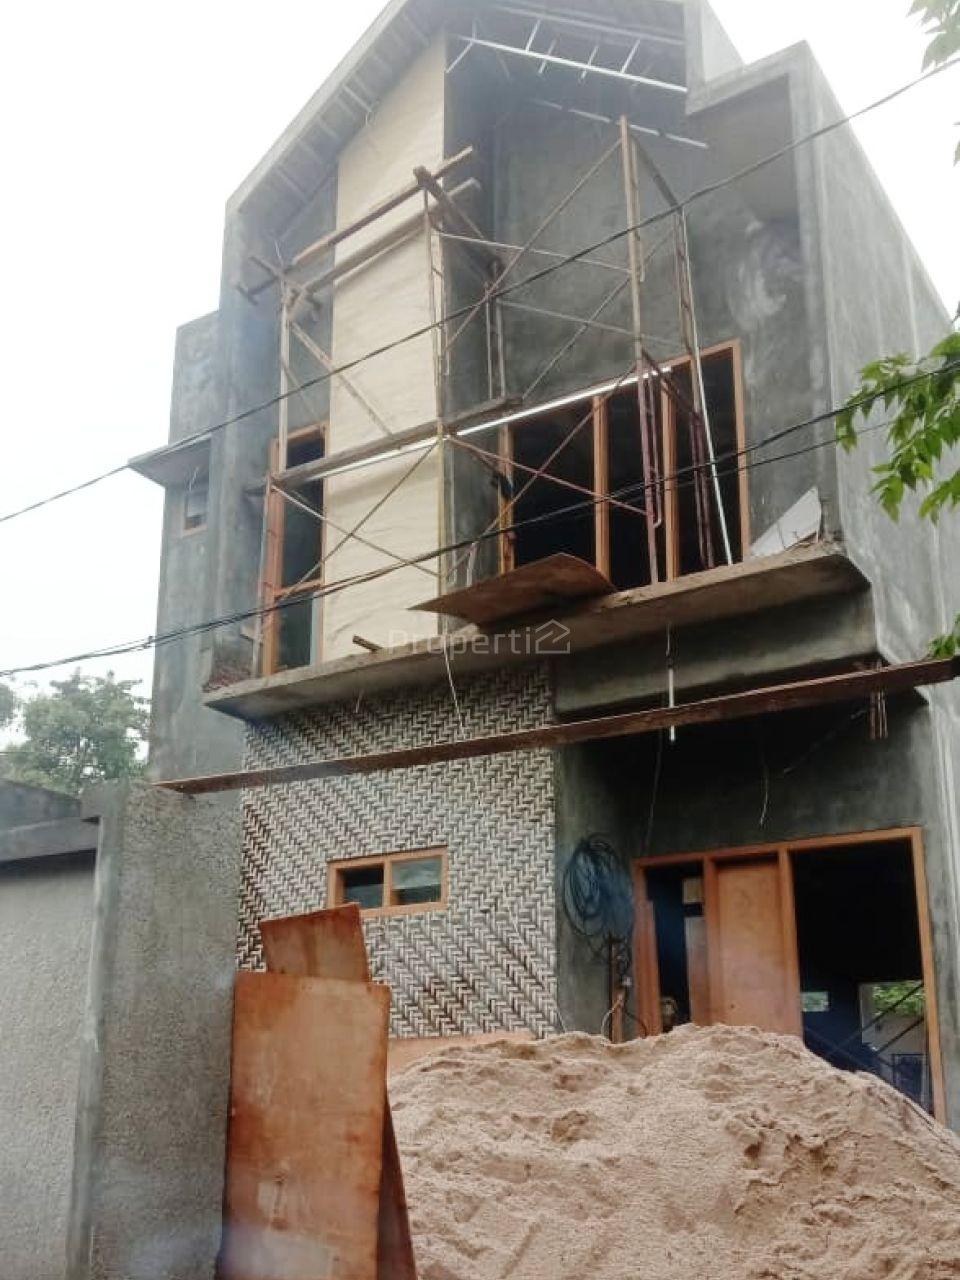 2 Storey House at Jl. Pondok Kelapa, East Jakarta , DKI Jakarta